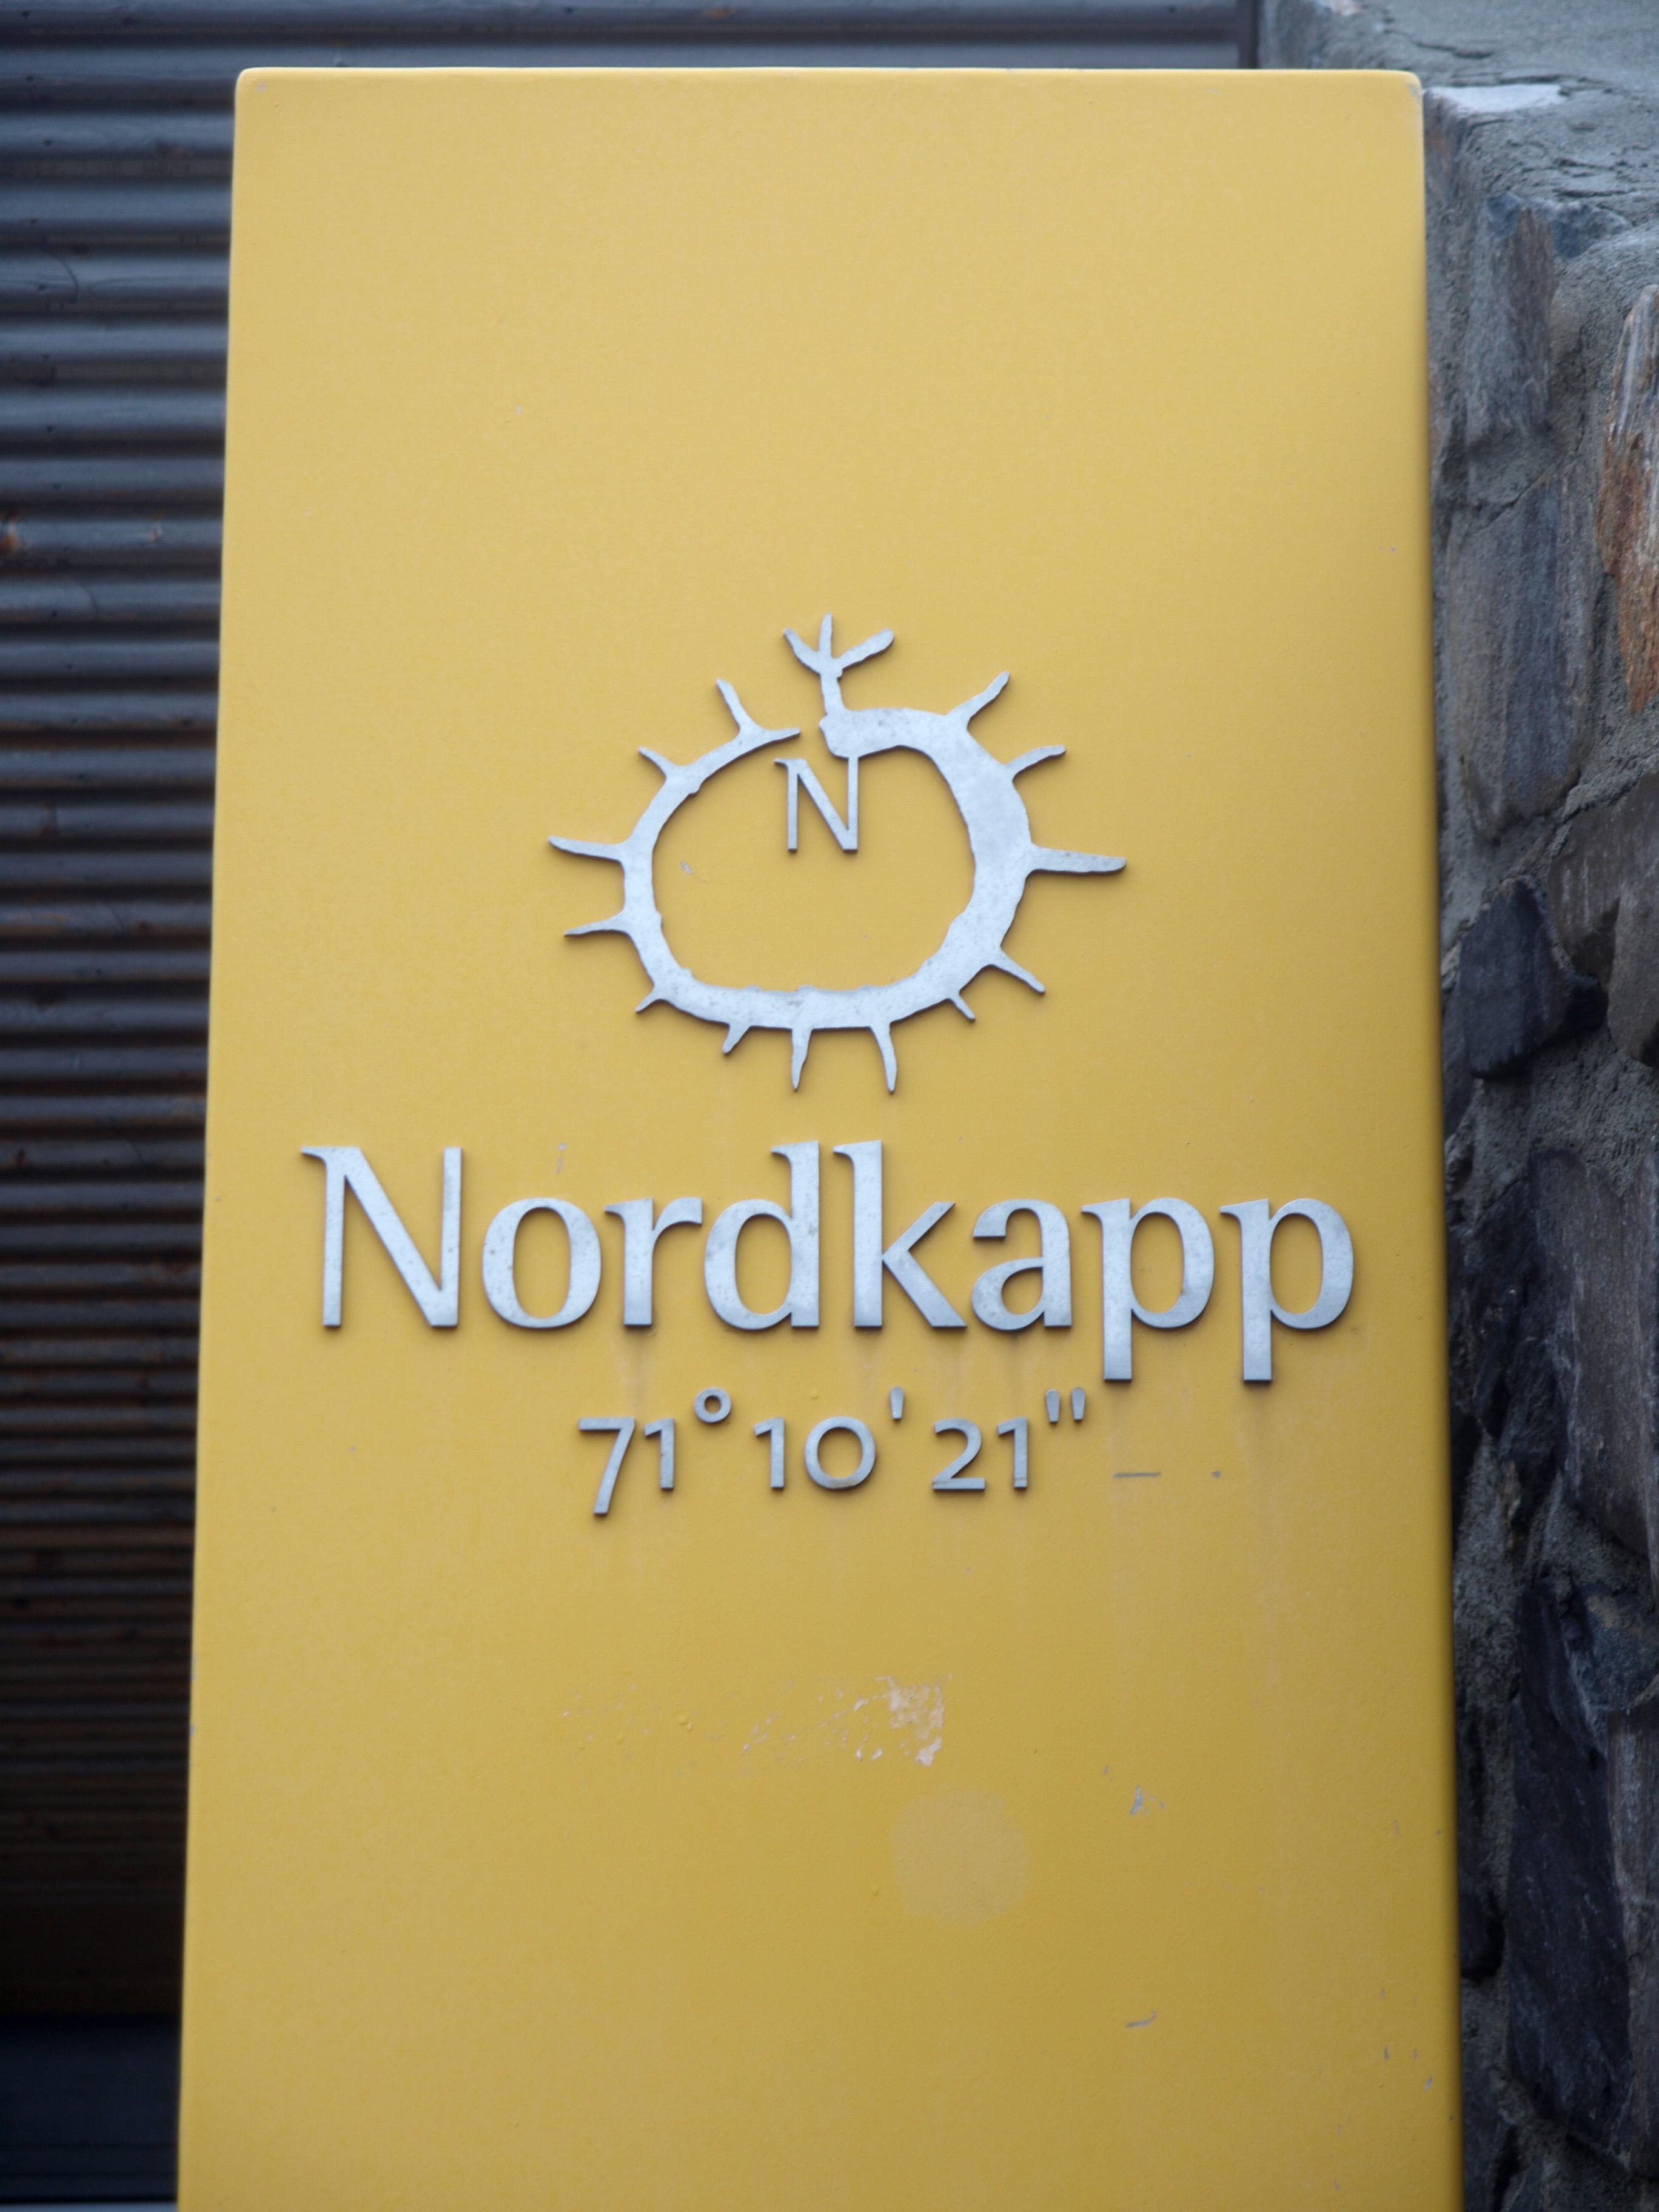 dating site i nordkapp singel treff hitra